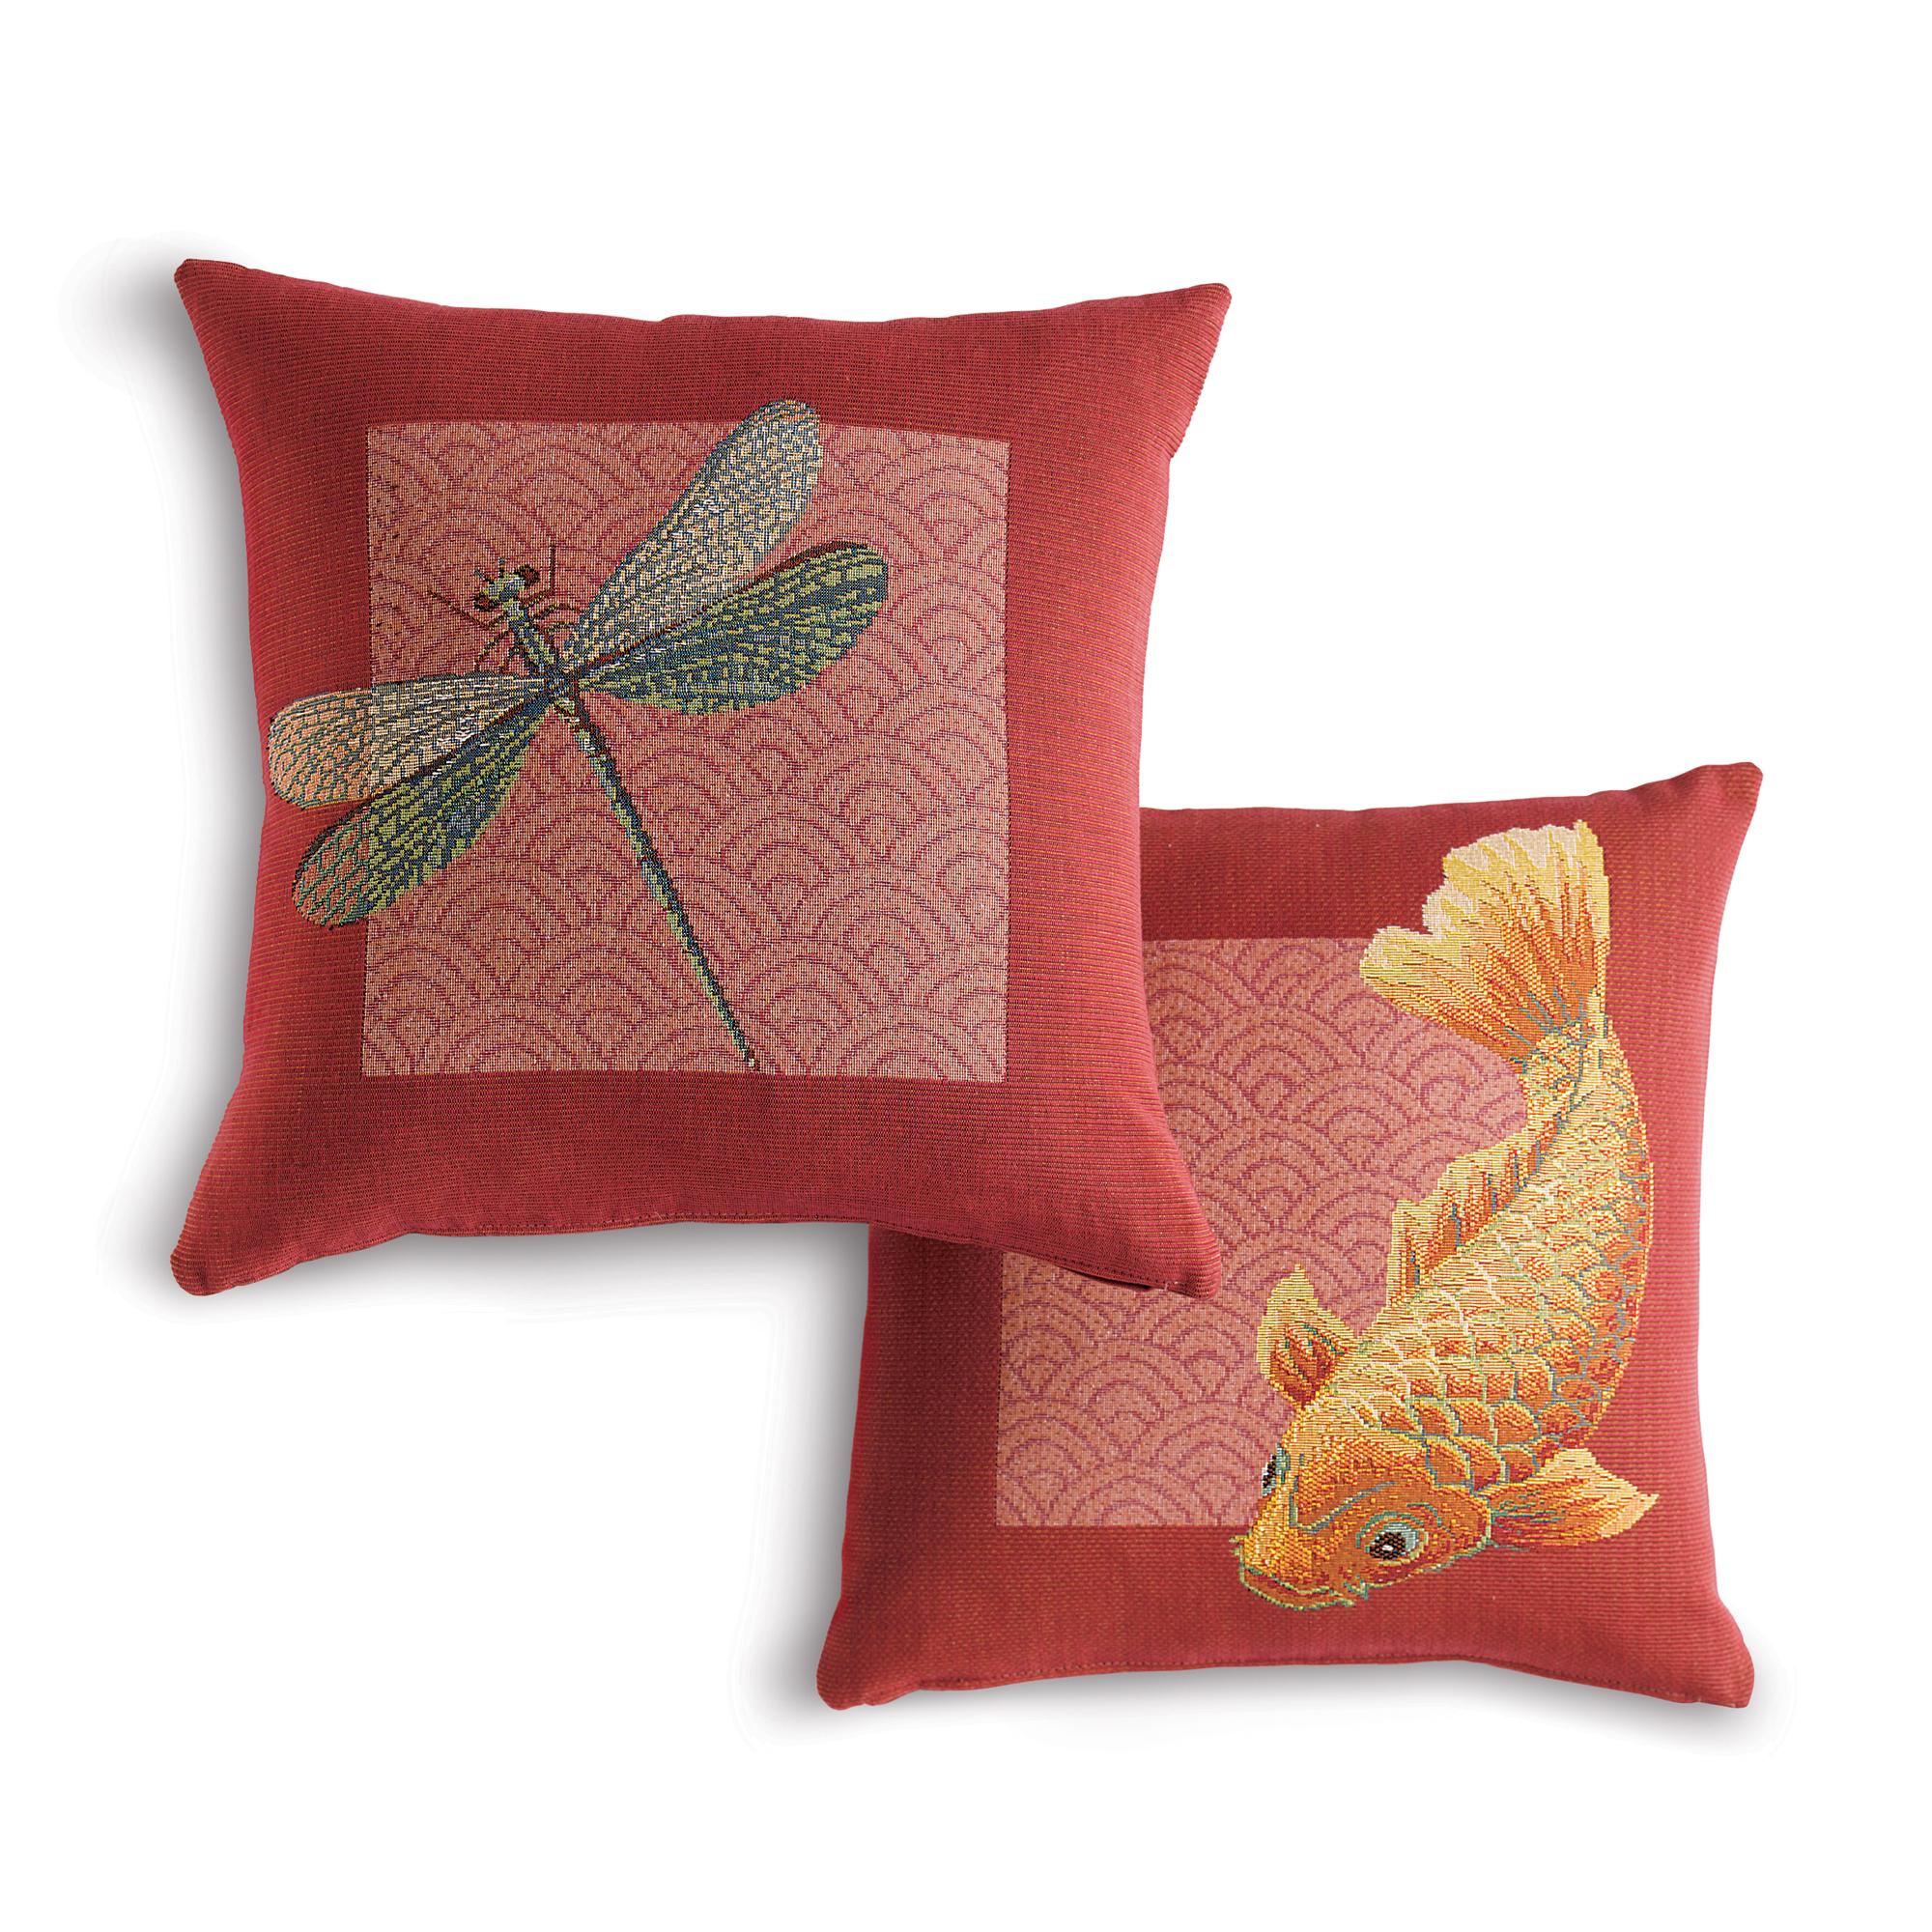 Throw Pillows Home : Dragonfly & Koi Pillows Gump s